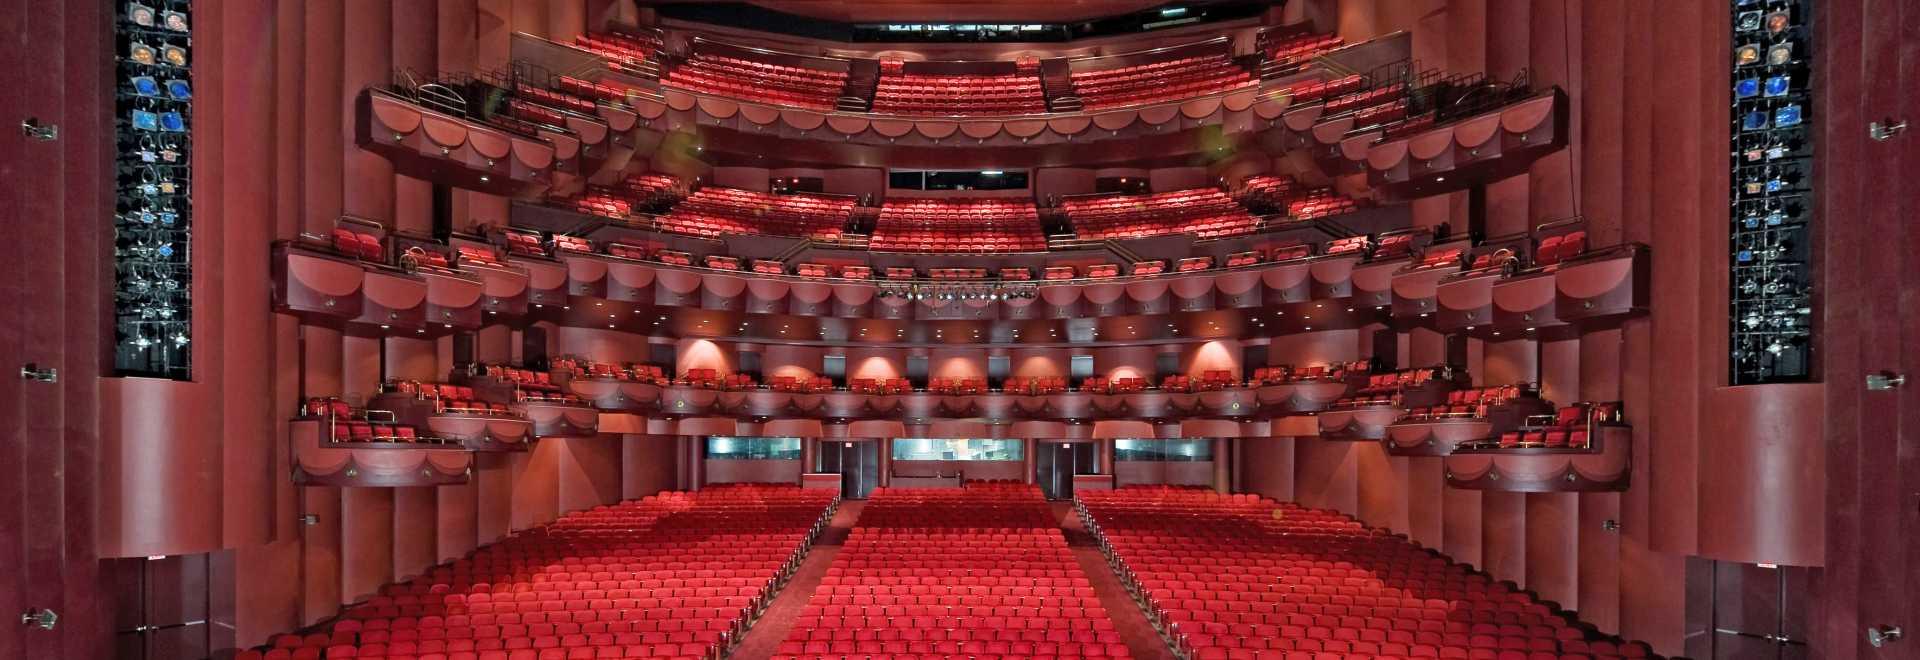 Wortham - Brown Theater Interior